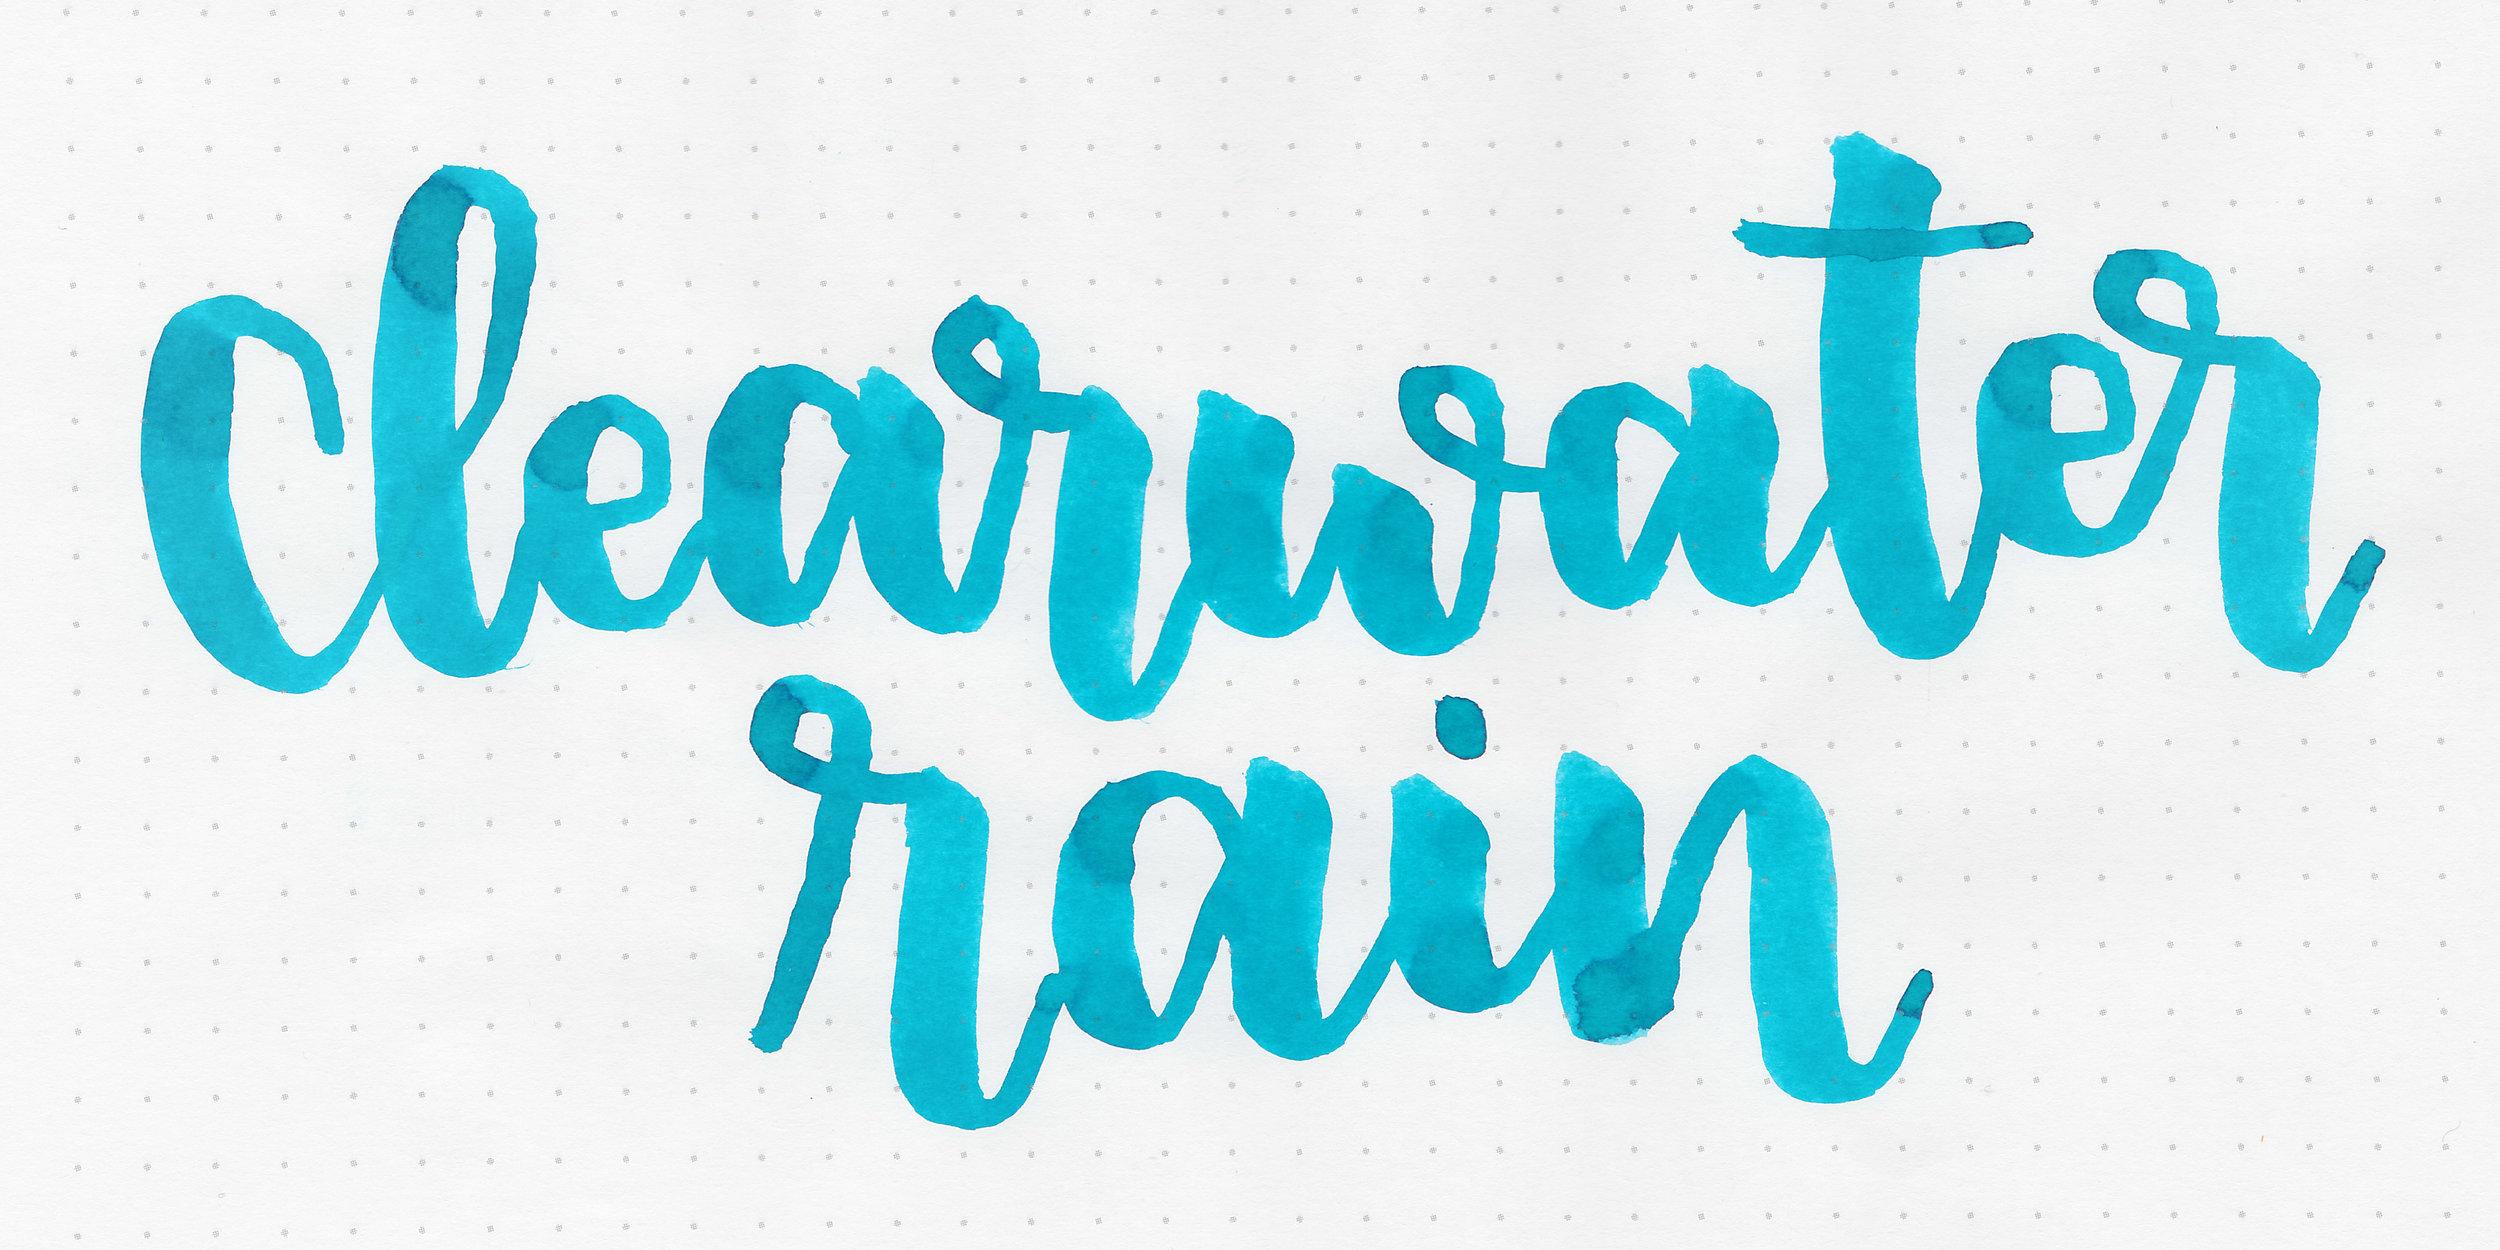 ro-clearwater-rain-5.jpg